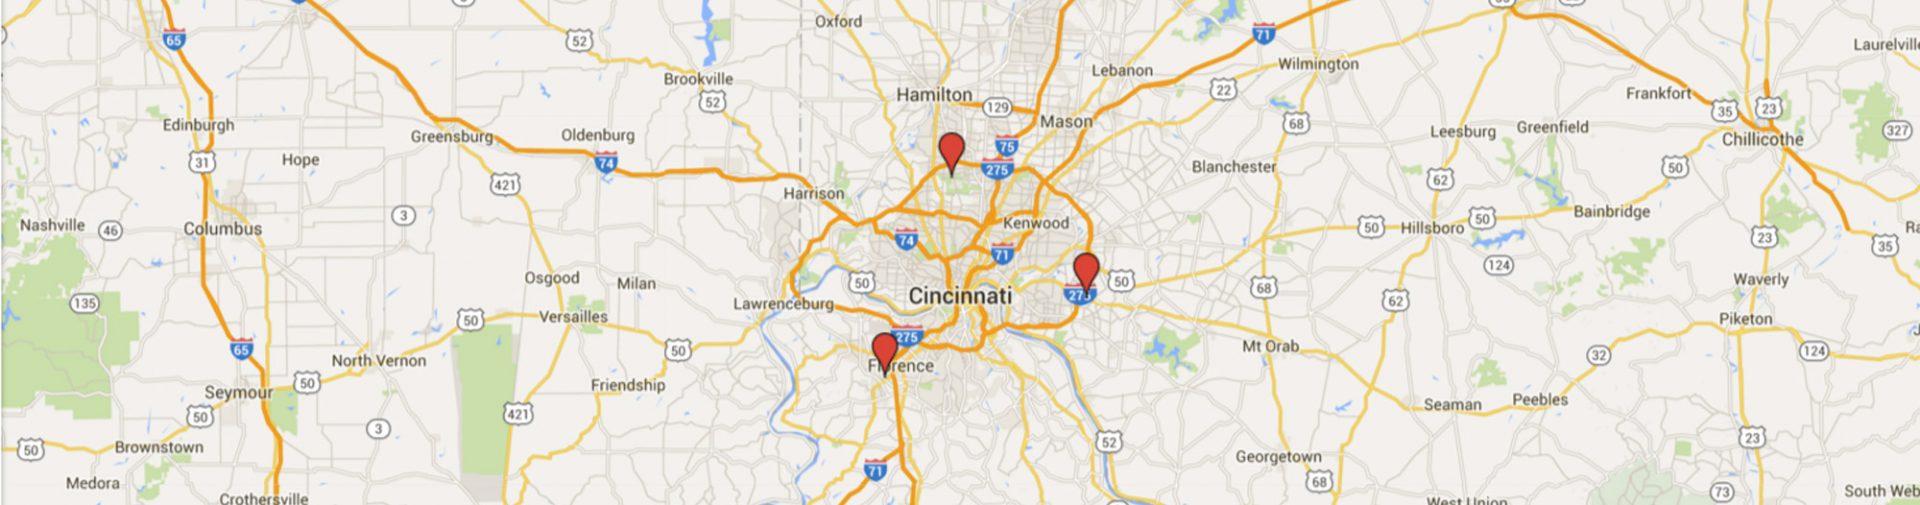 Retractable Awnings Cincinnati